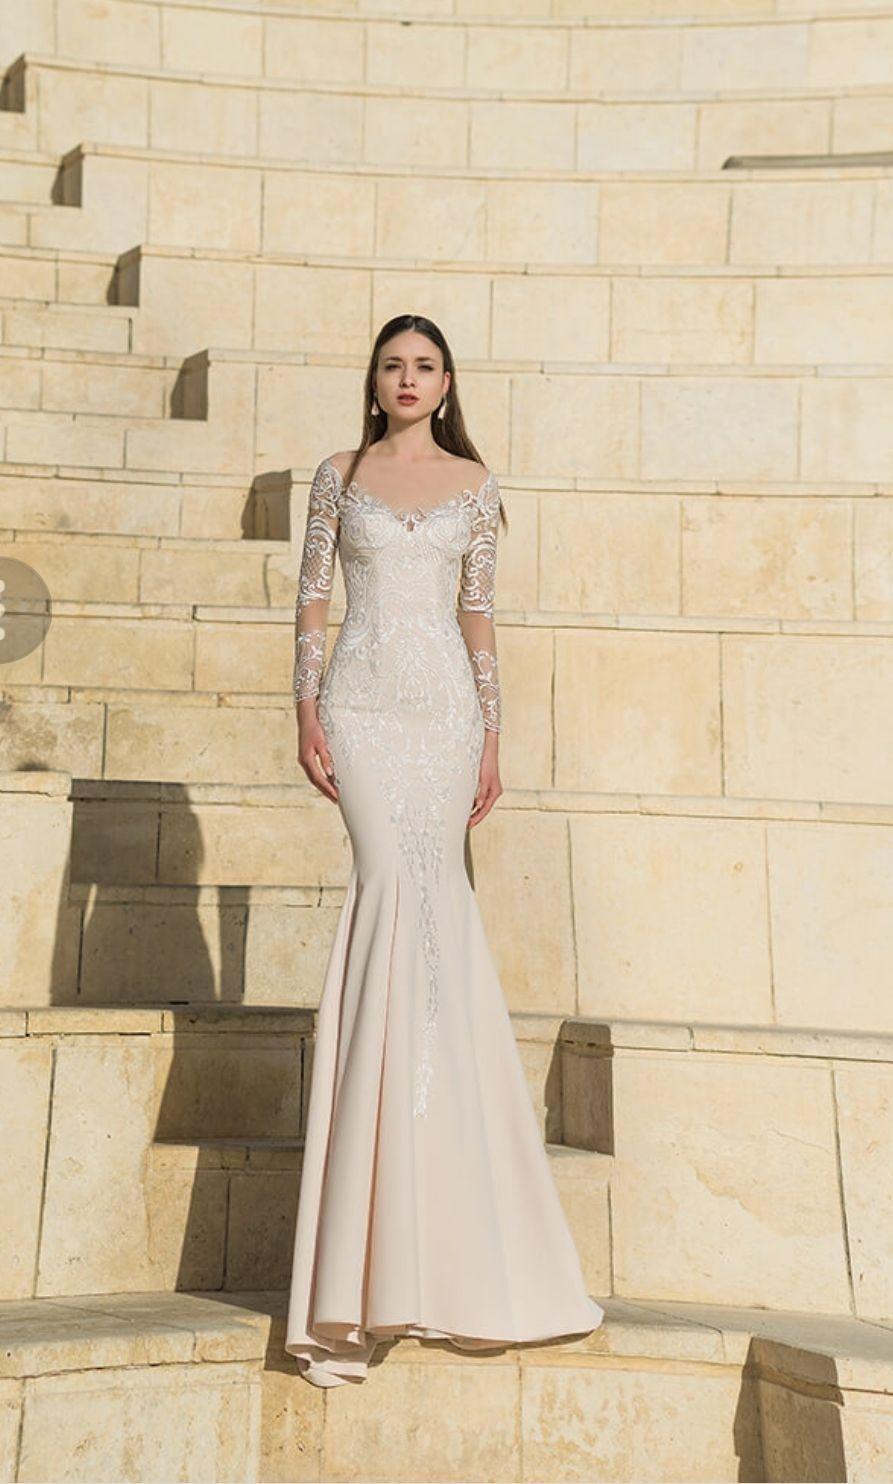 b224fdf8c5fb Populære Havfrue brudekjole med lange ærmer og skørt. Www.weddingdeluxe.dk  OH72